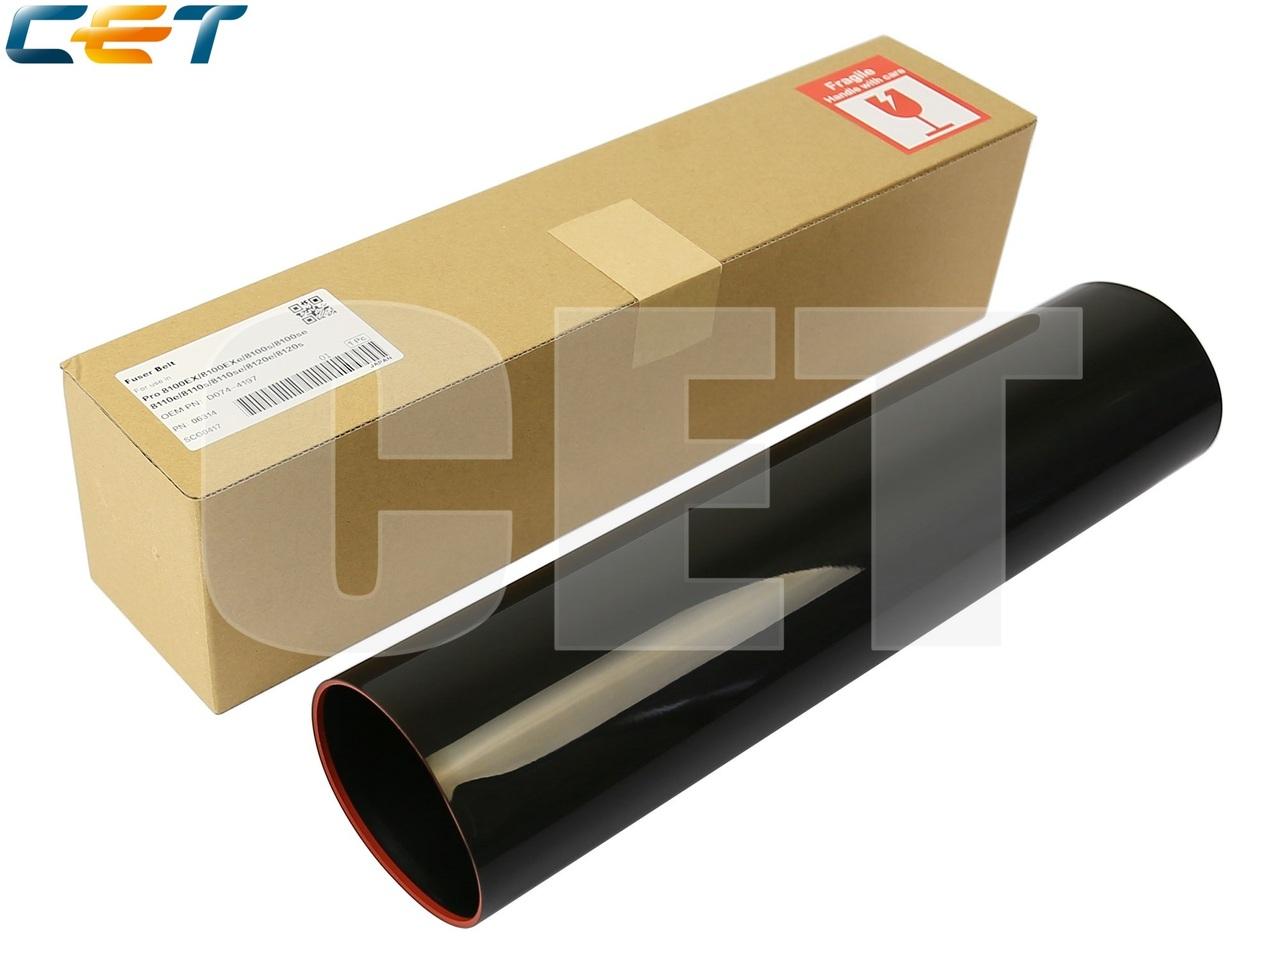 Термопленка D074-4197 для RICOH Pro 8100s/8110s/8120s(CET), CET6314